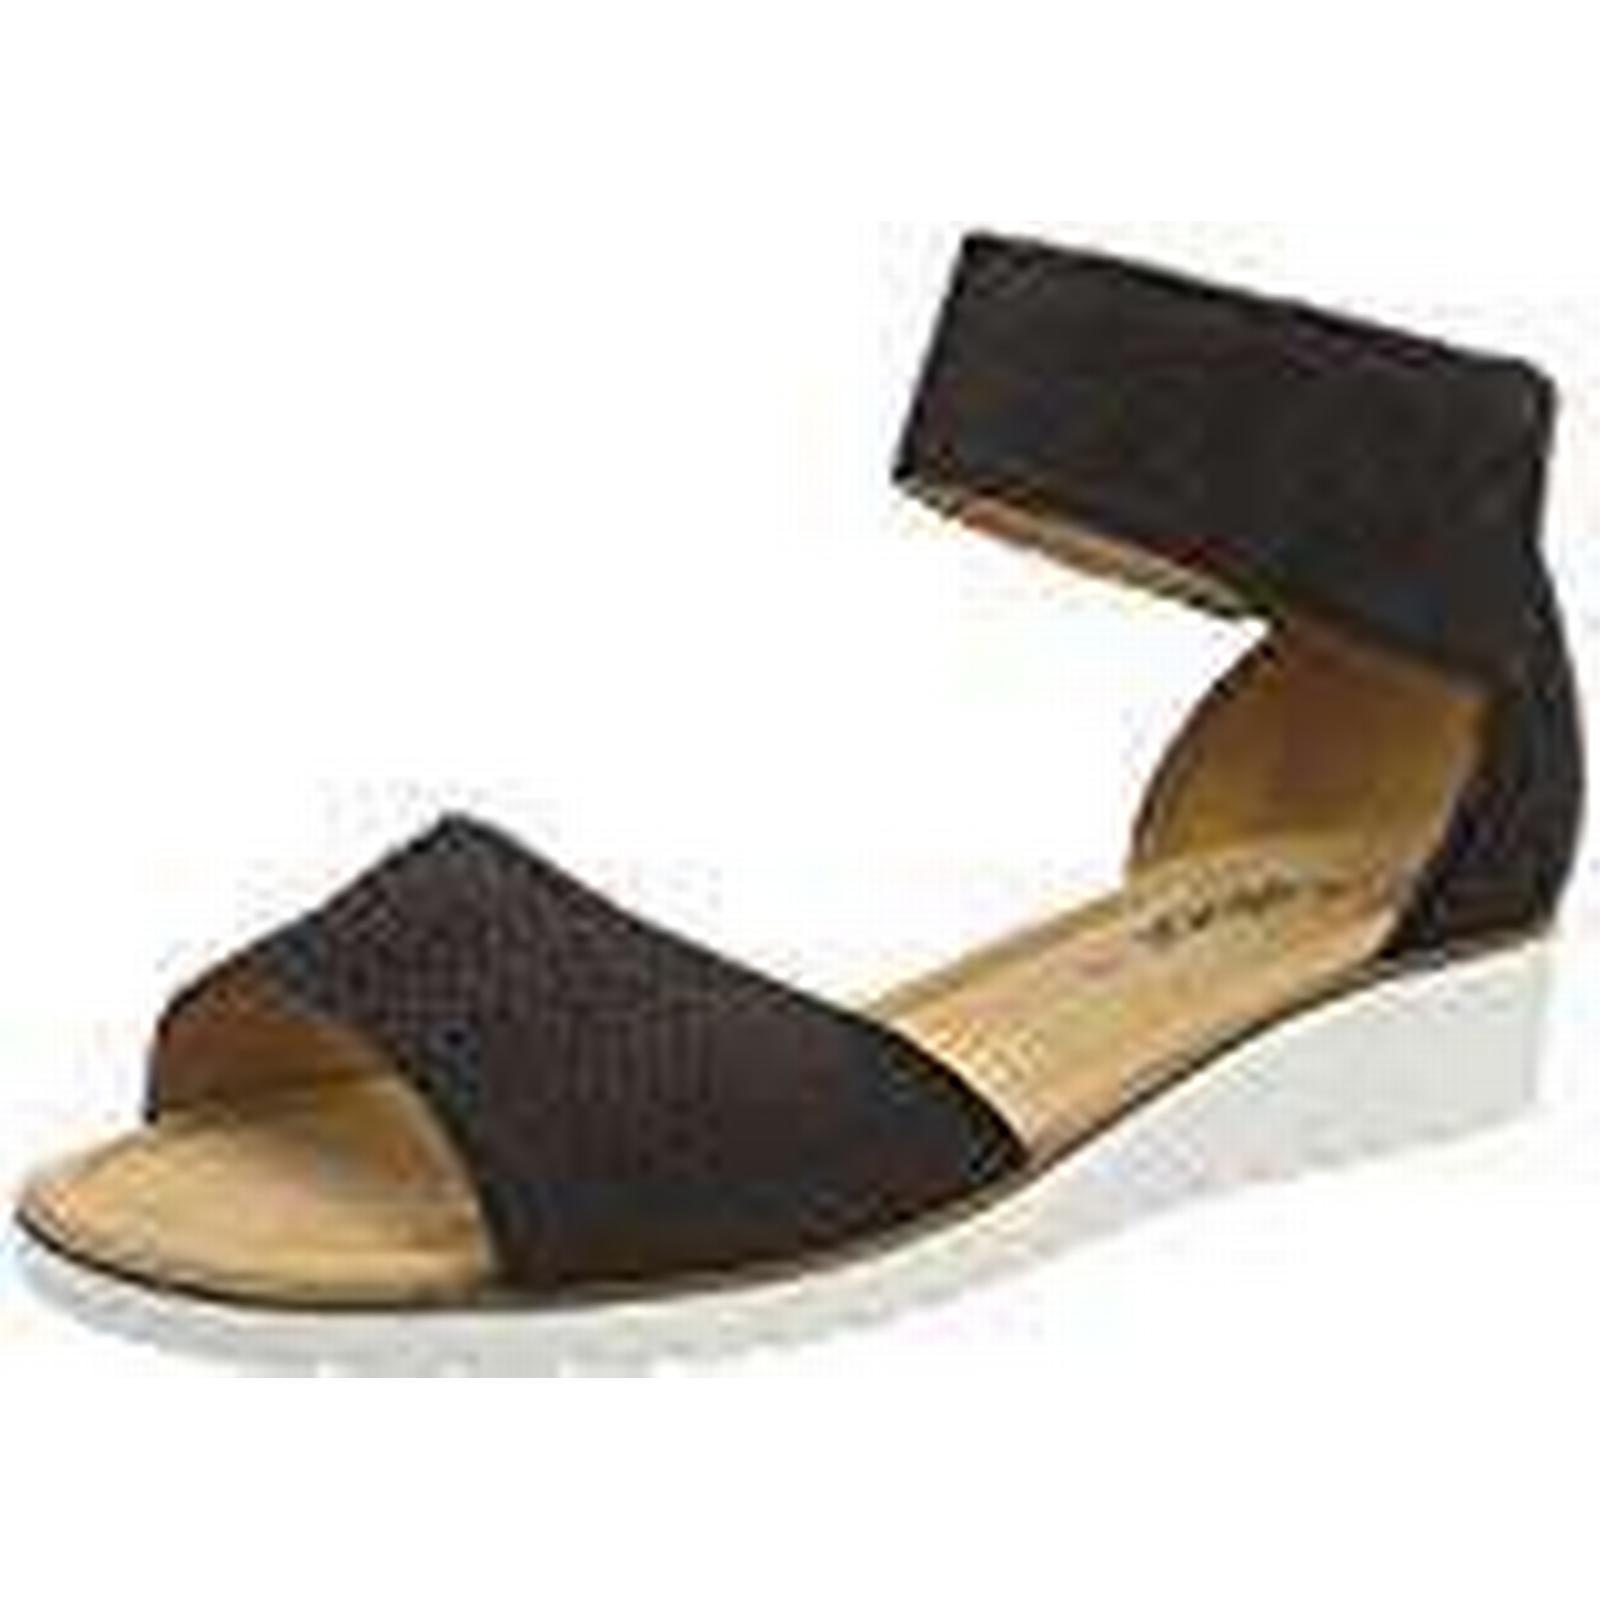 Gabor Shoes Women''s Casual 7 Ankle Strap Sandals, Black (Schwarz), 7 Casual UK b04732